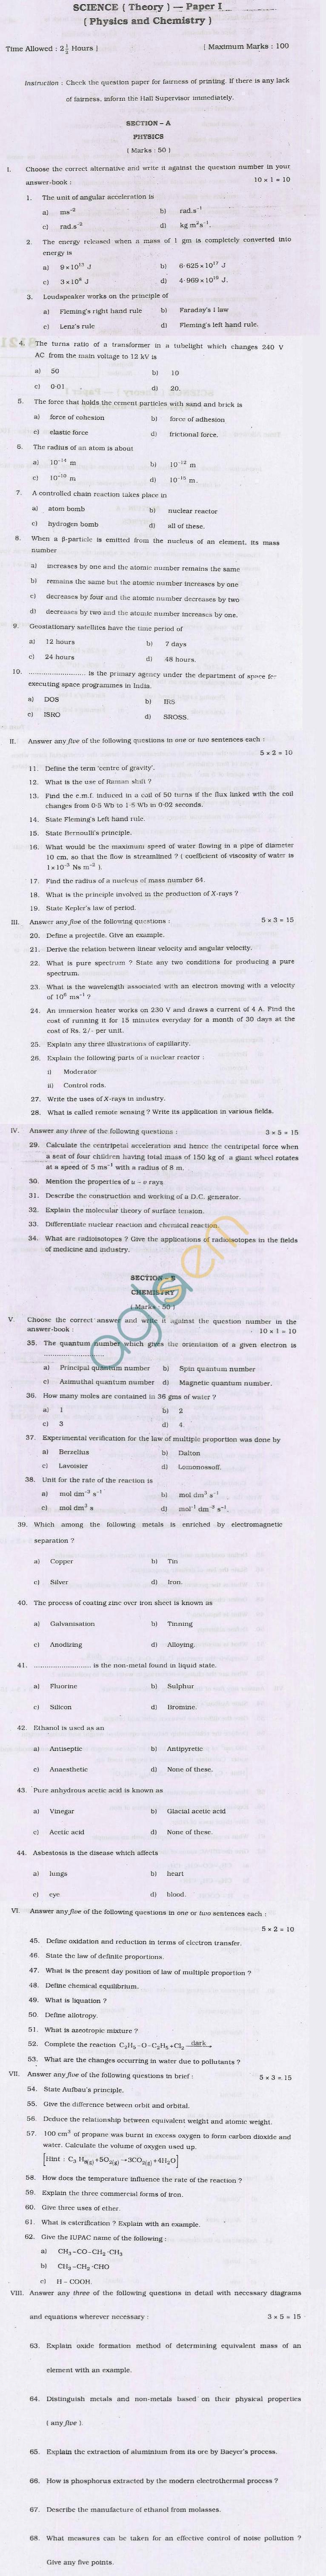 TN Board MatriculationScienceQuestion PapersJune 2011